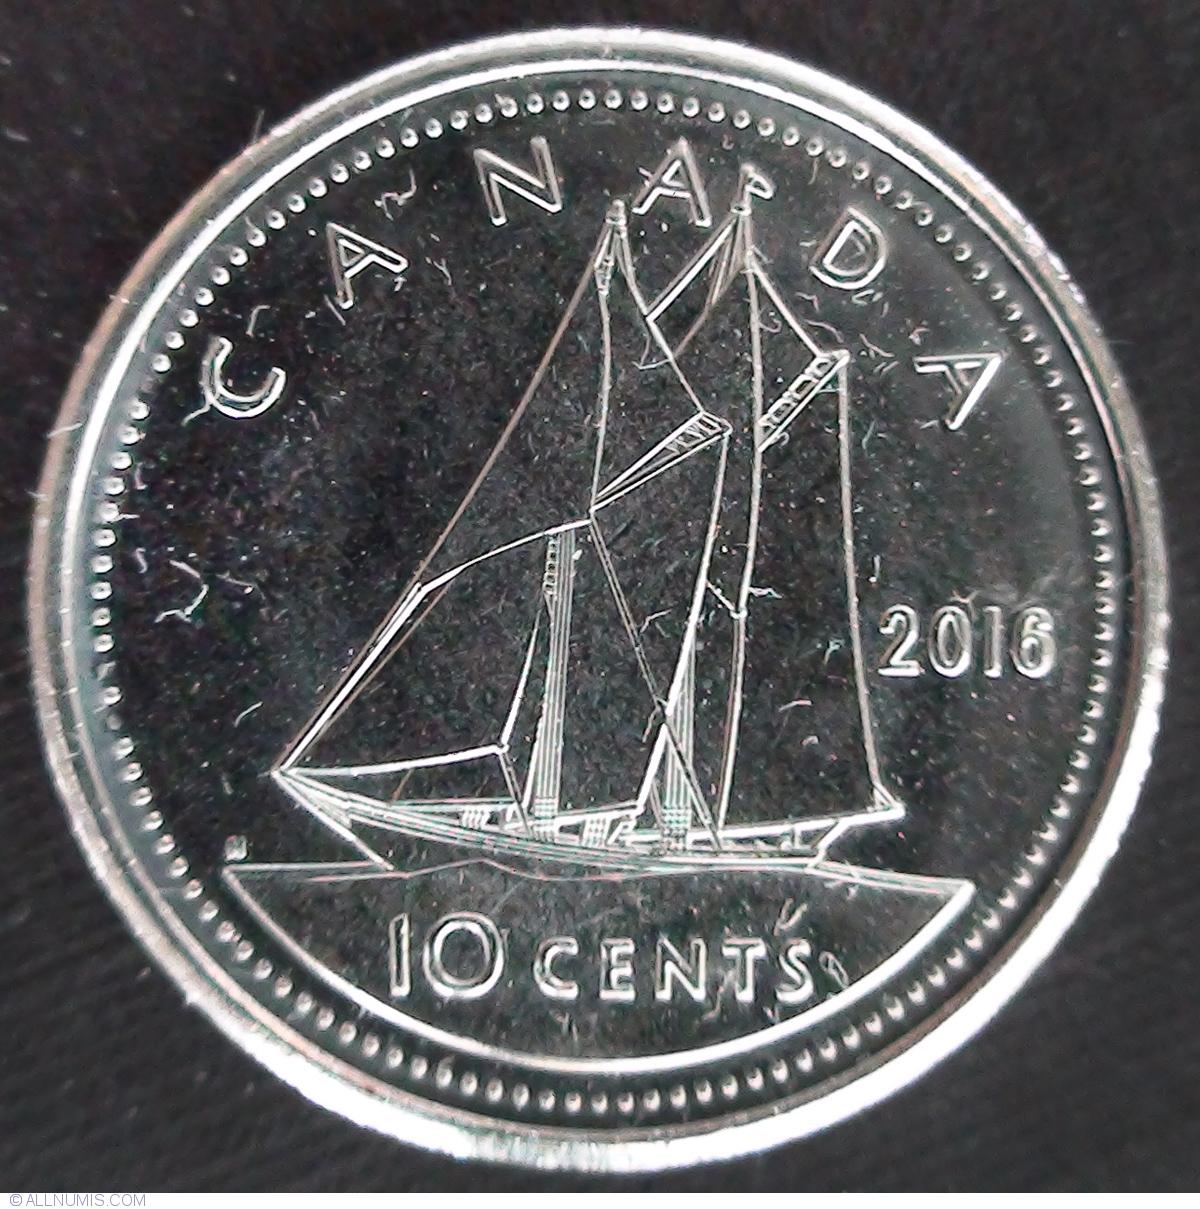 10 cents 2016, Elizabeth II (1953-present) - Canada - Coin ...